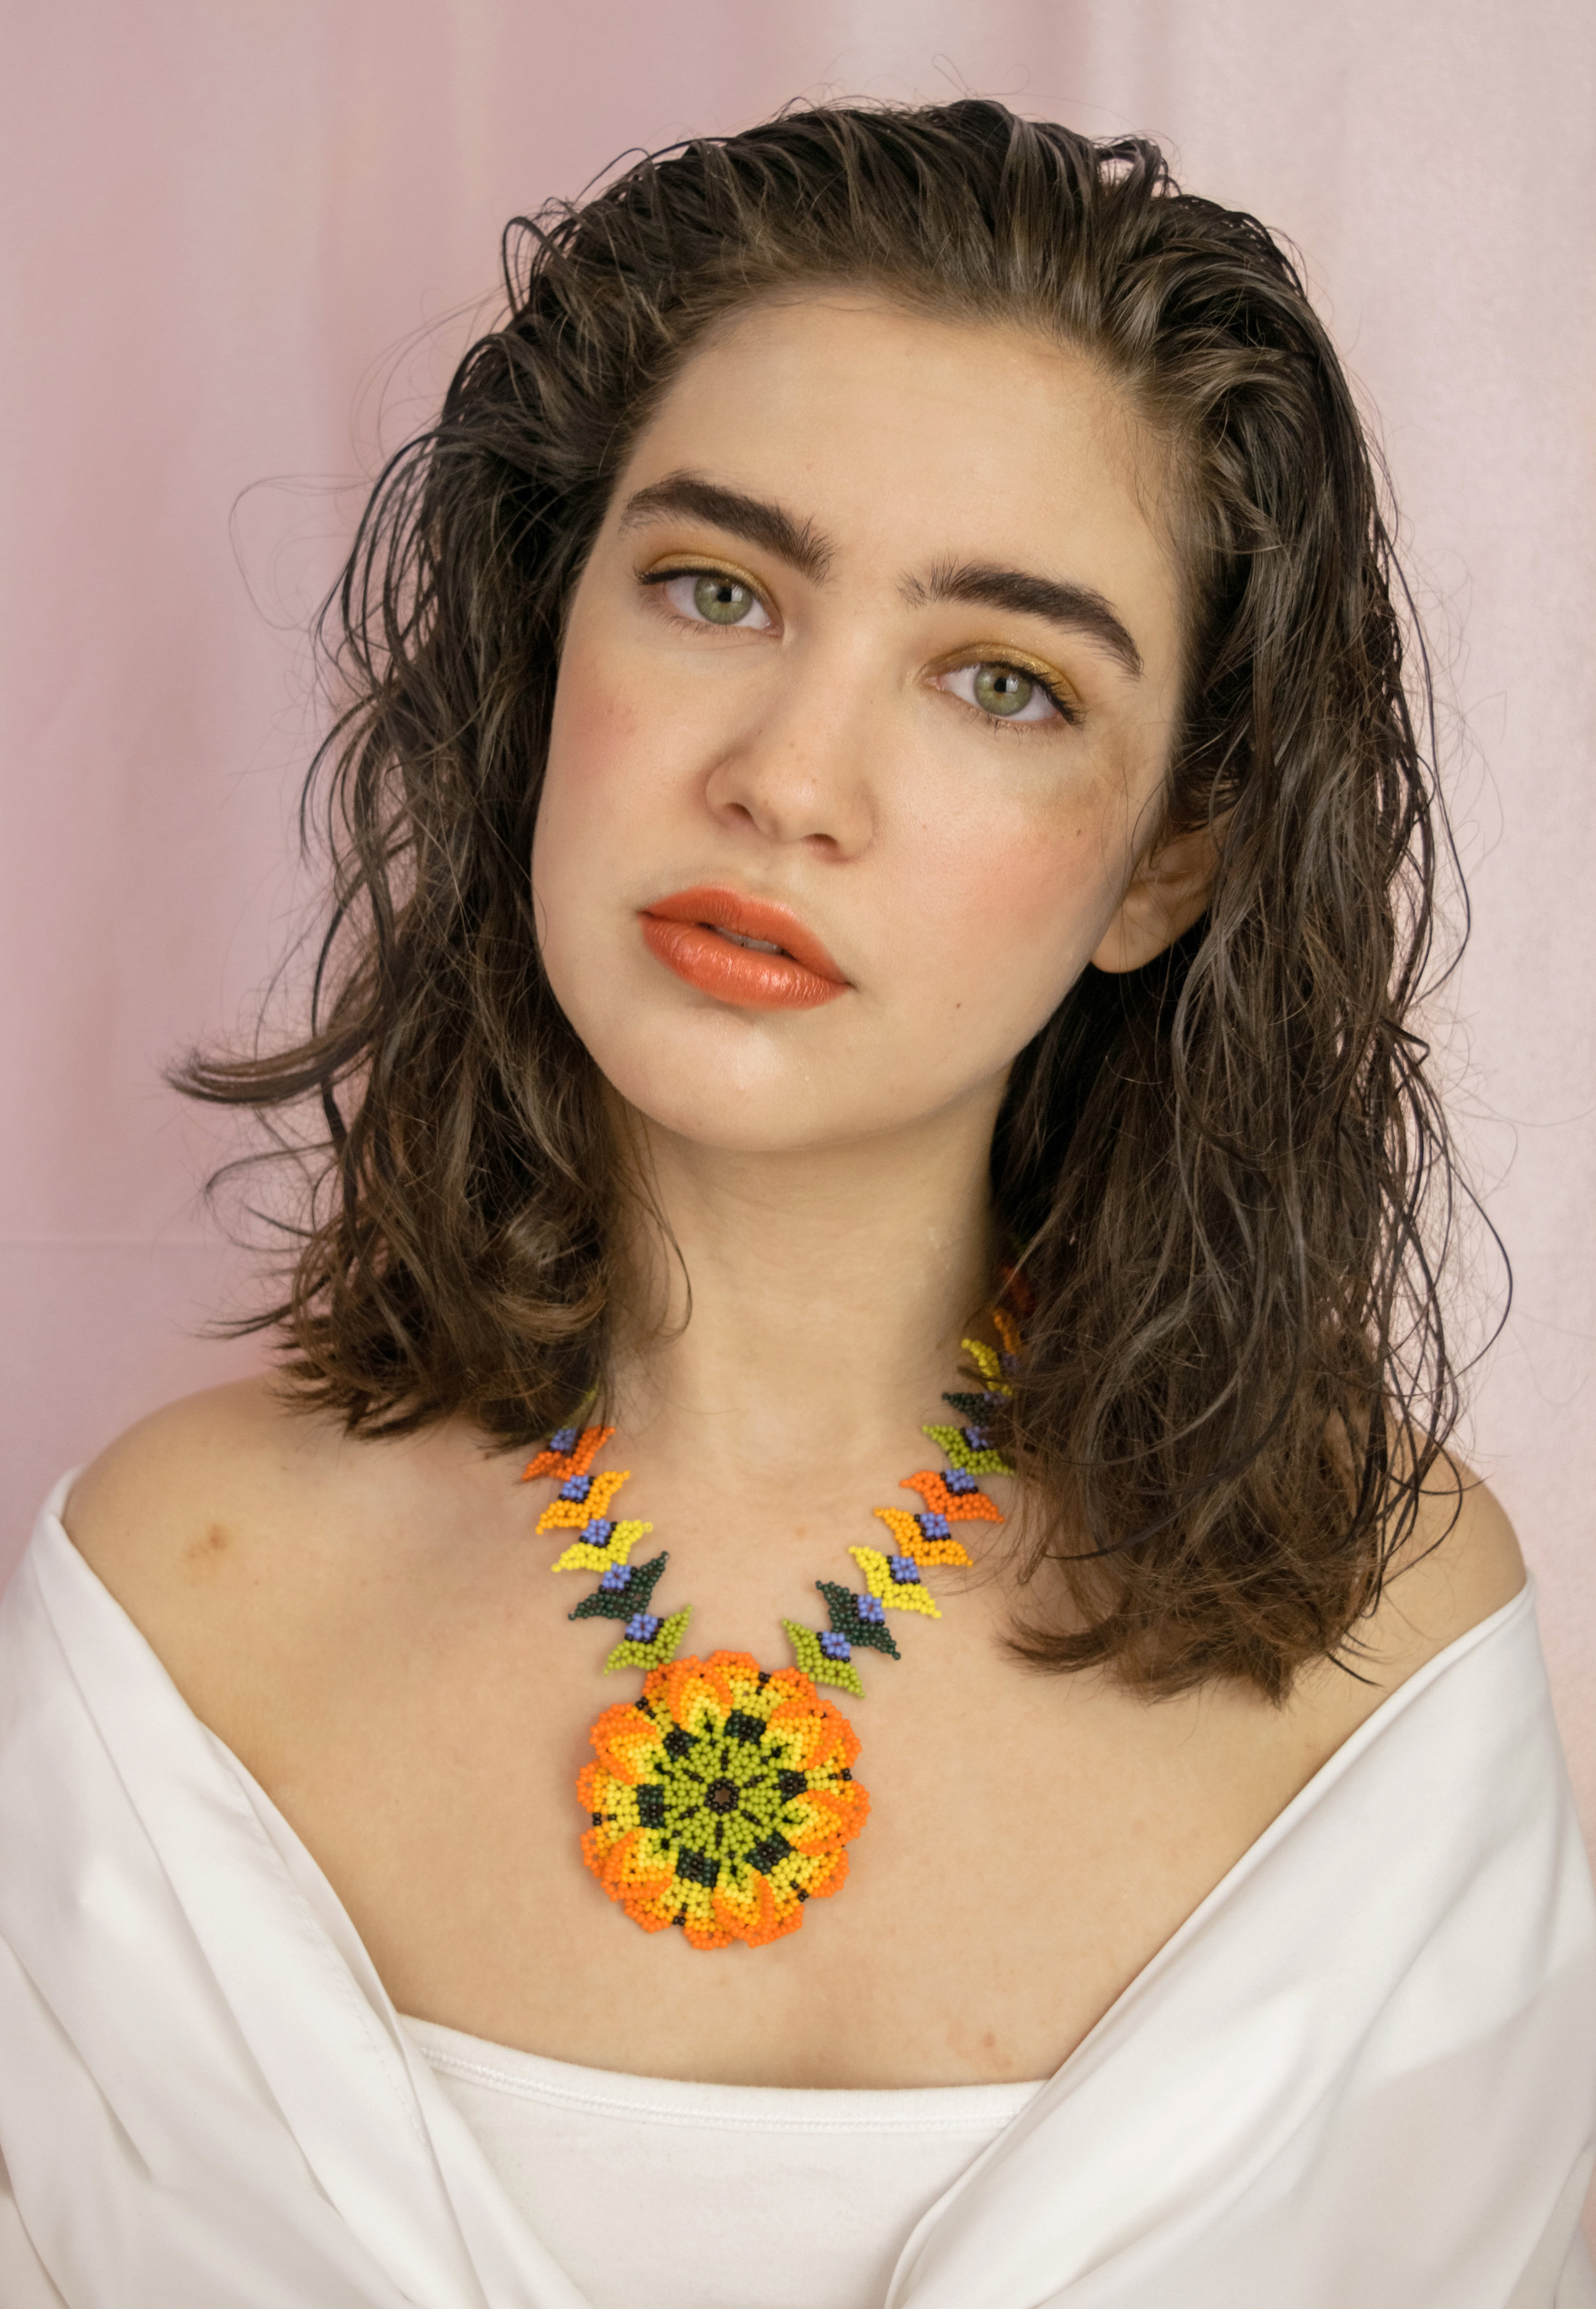 Karla is wearing Au Naturale's High Lustre Lip Gloss in Poppy.